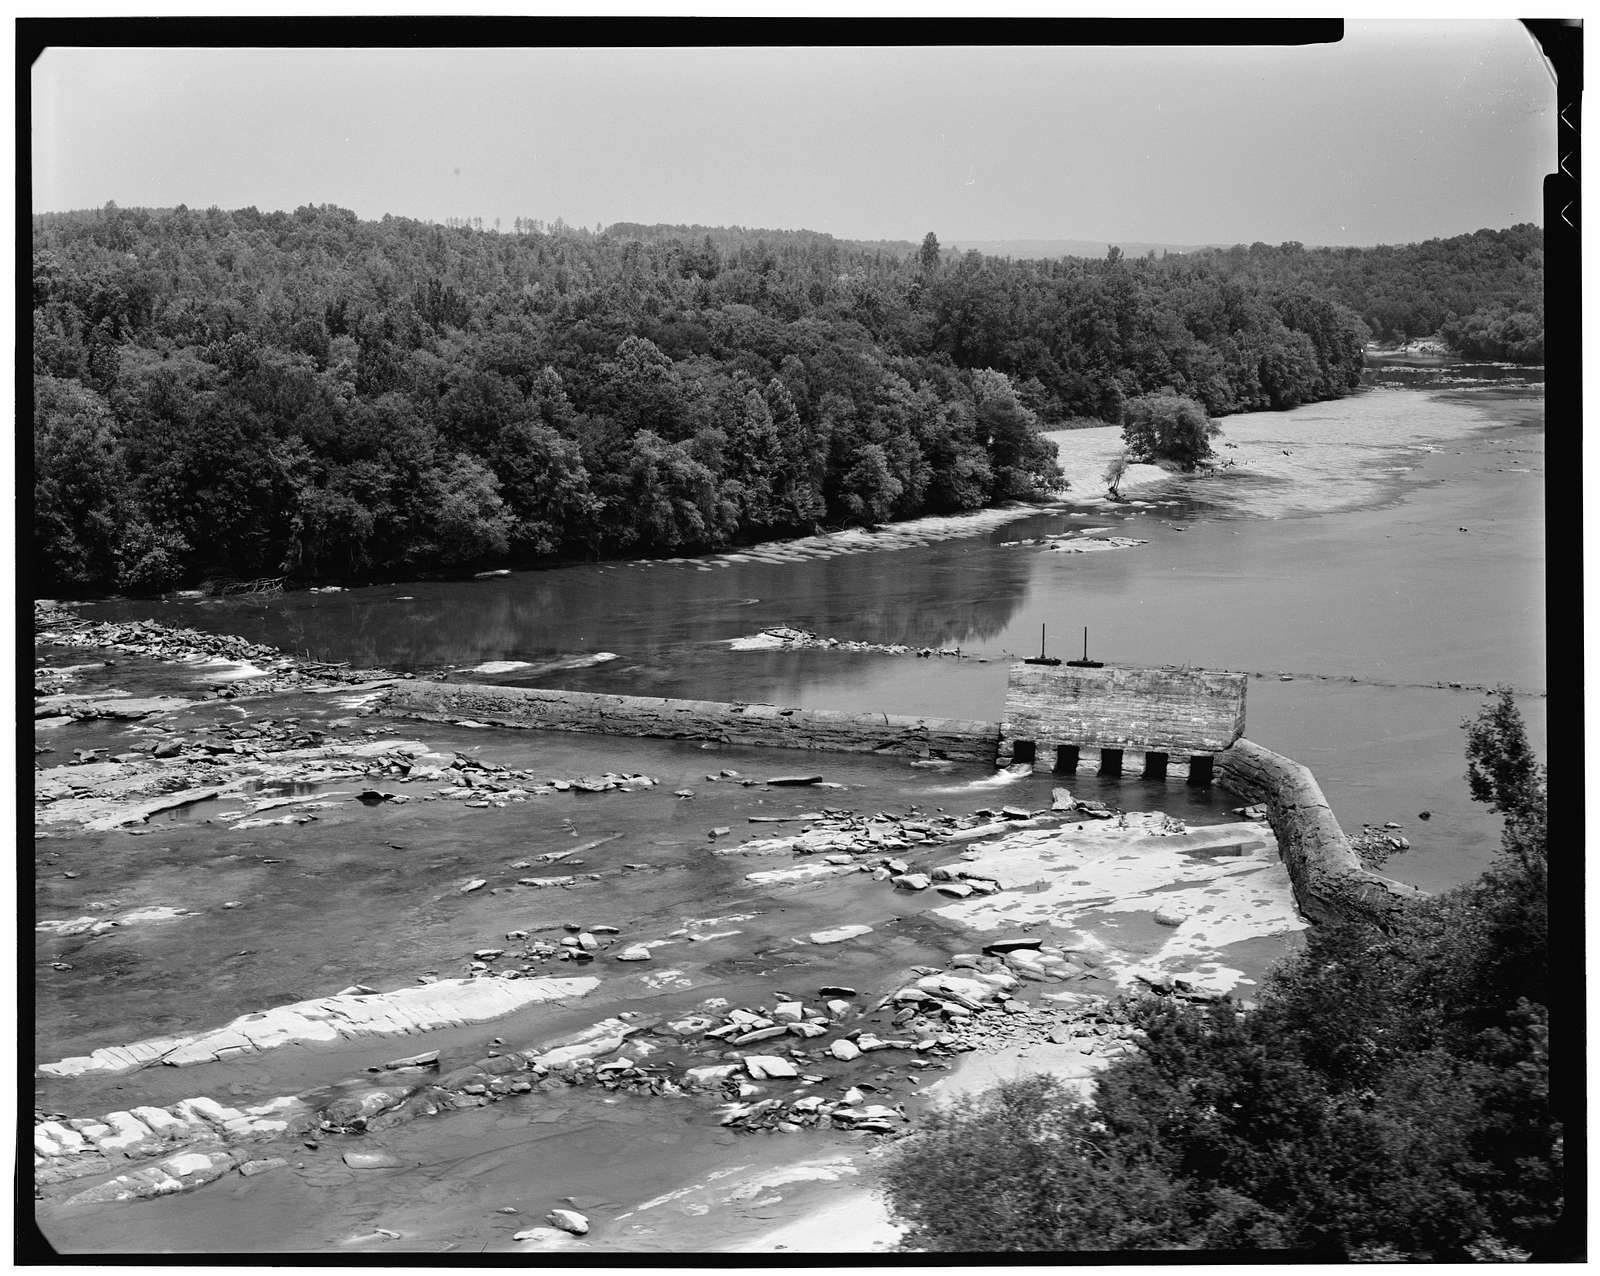 Gregg Shoals Dam & Power Plant, Across Savannah River, Lowndesville, Abbeville County, SC